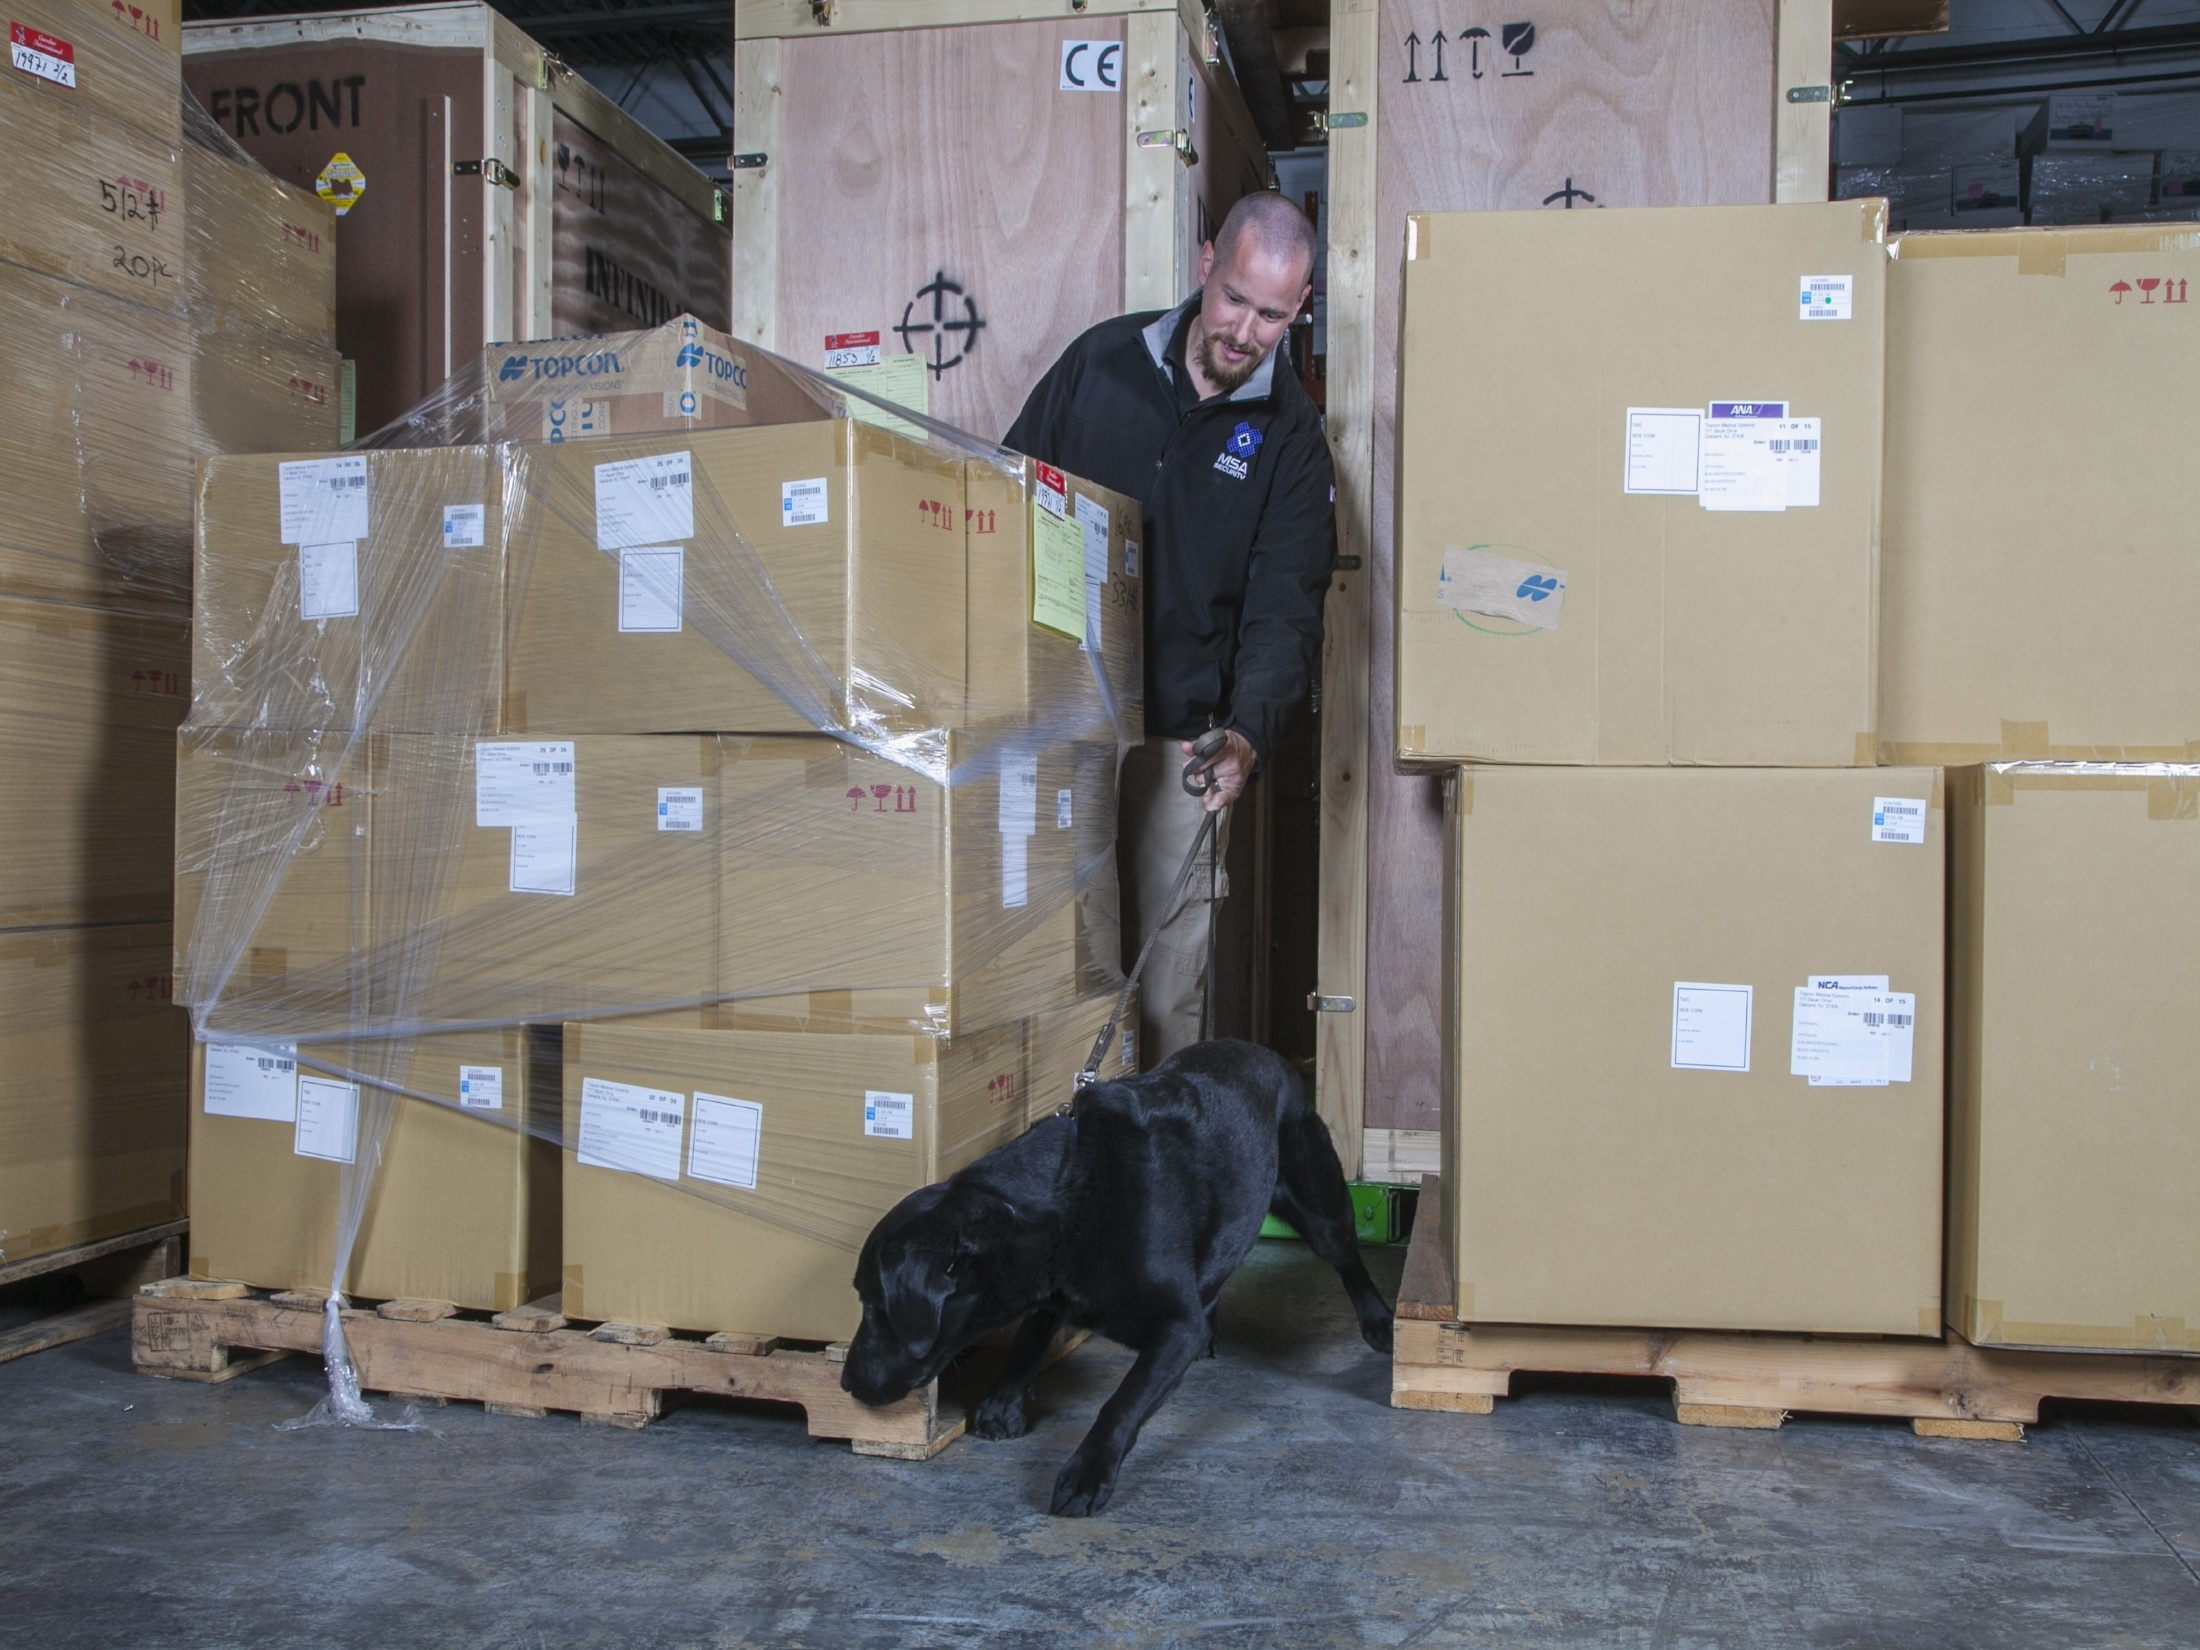 MSA Bomb Sniffing Dog Screening Cargo for Explosives